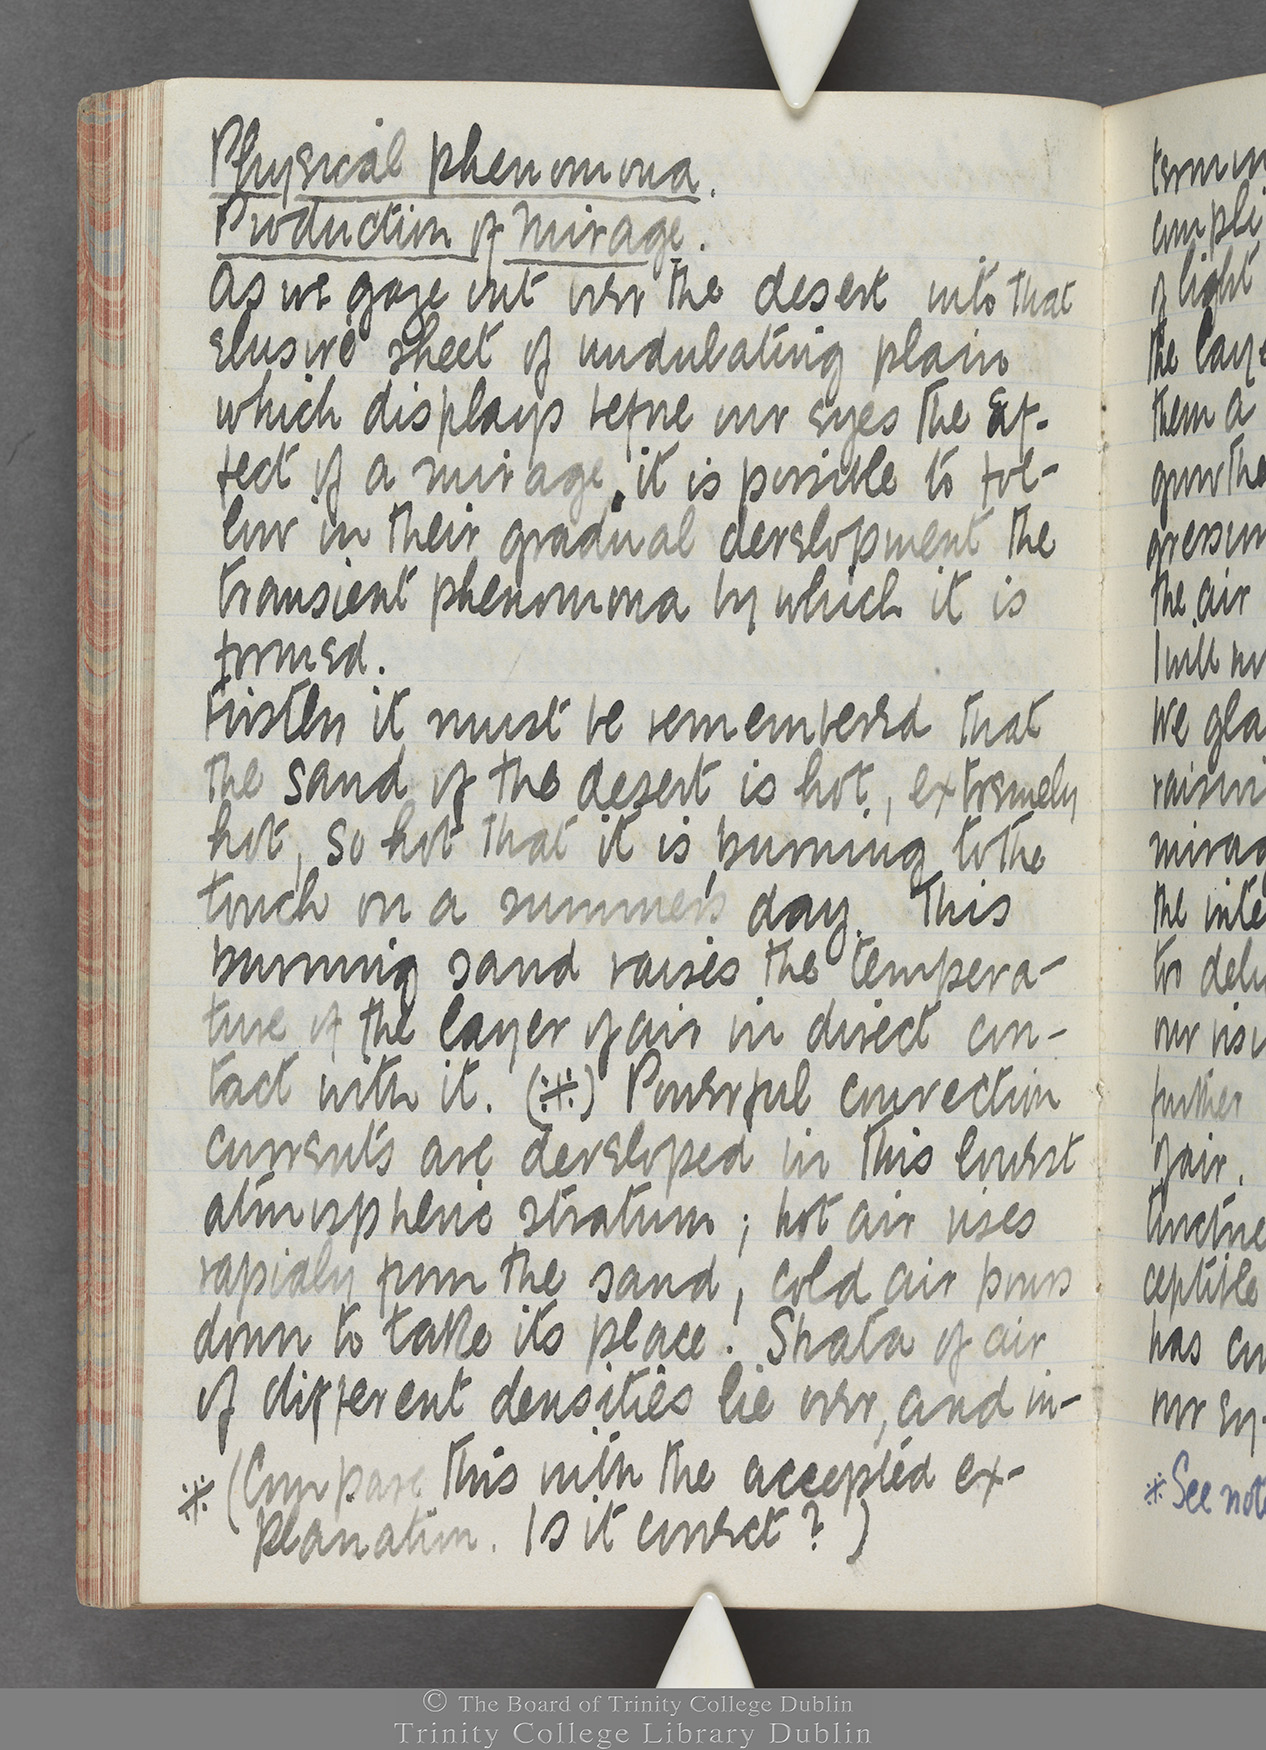 TCD MS 10515 folio 53v